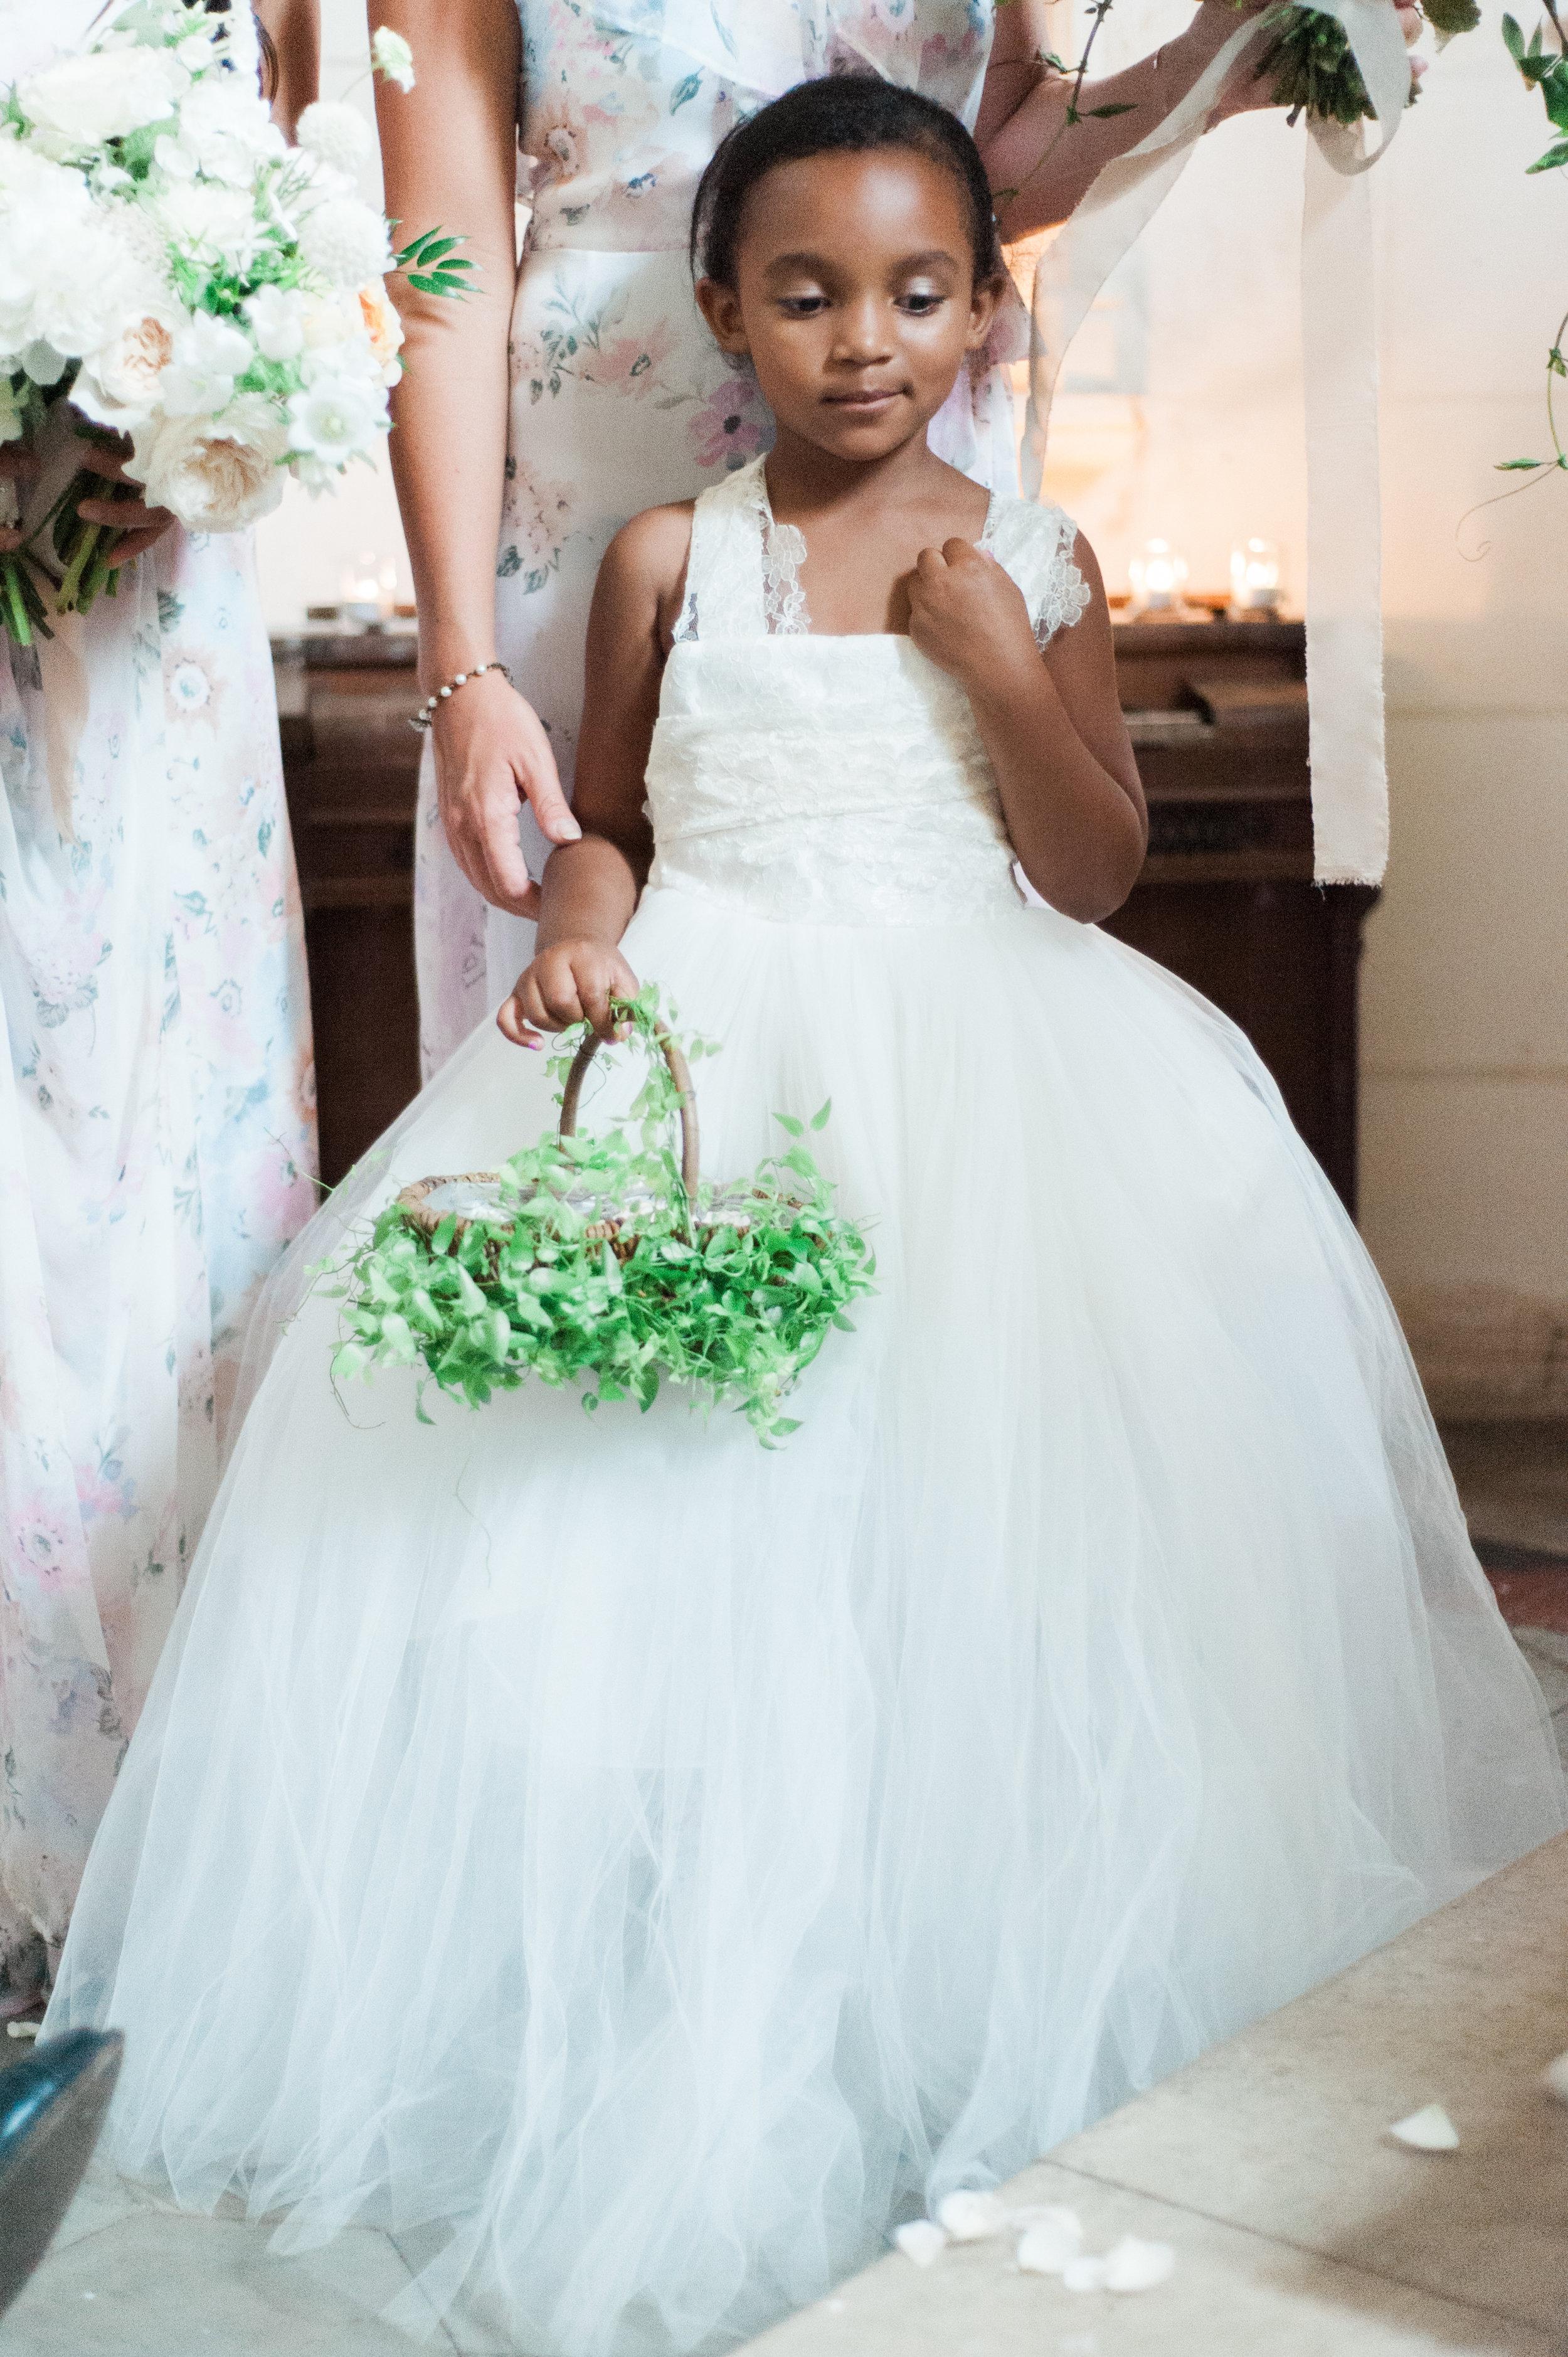 fine art wedding florist, foraged floral, chateau bouthonvilliers wedding florist.jpg